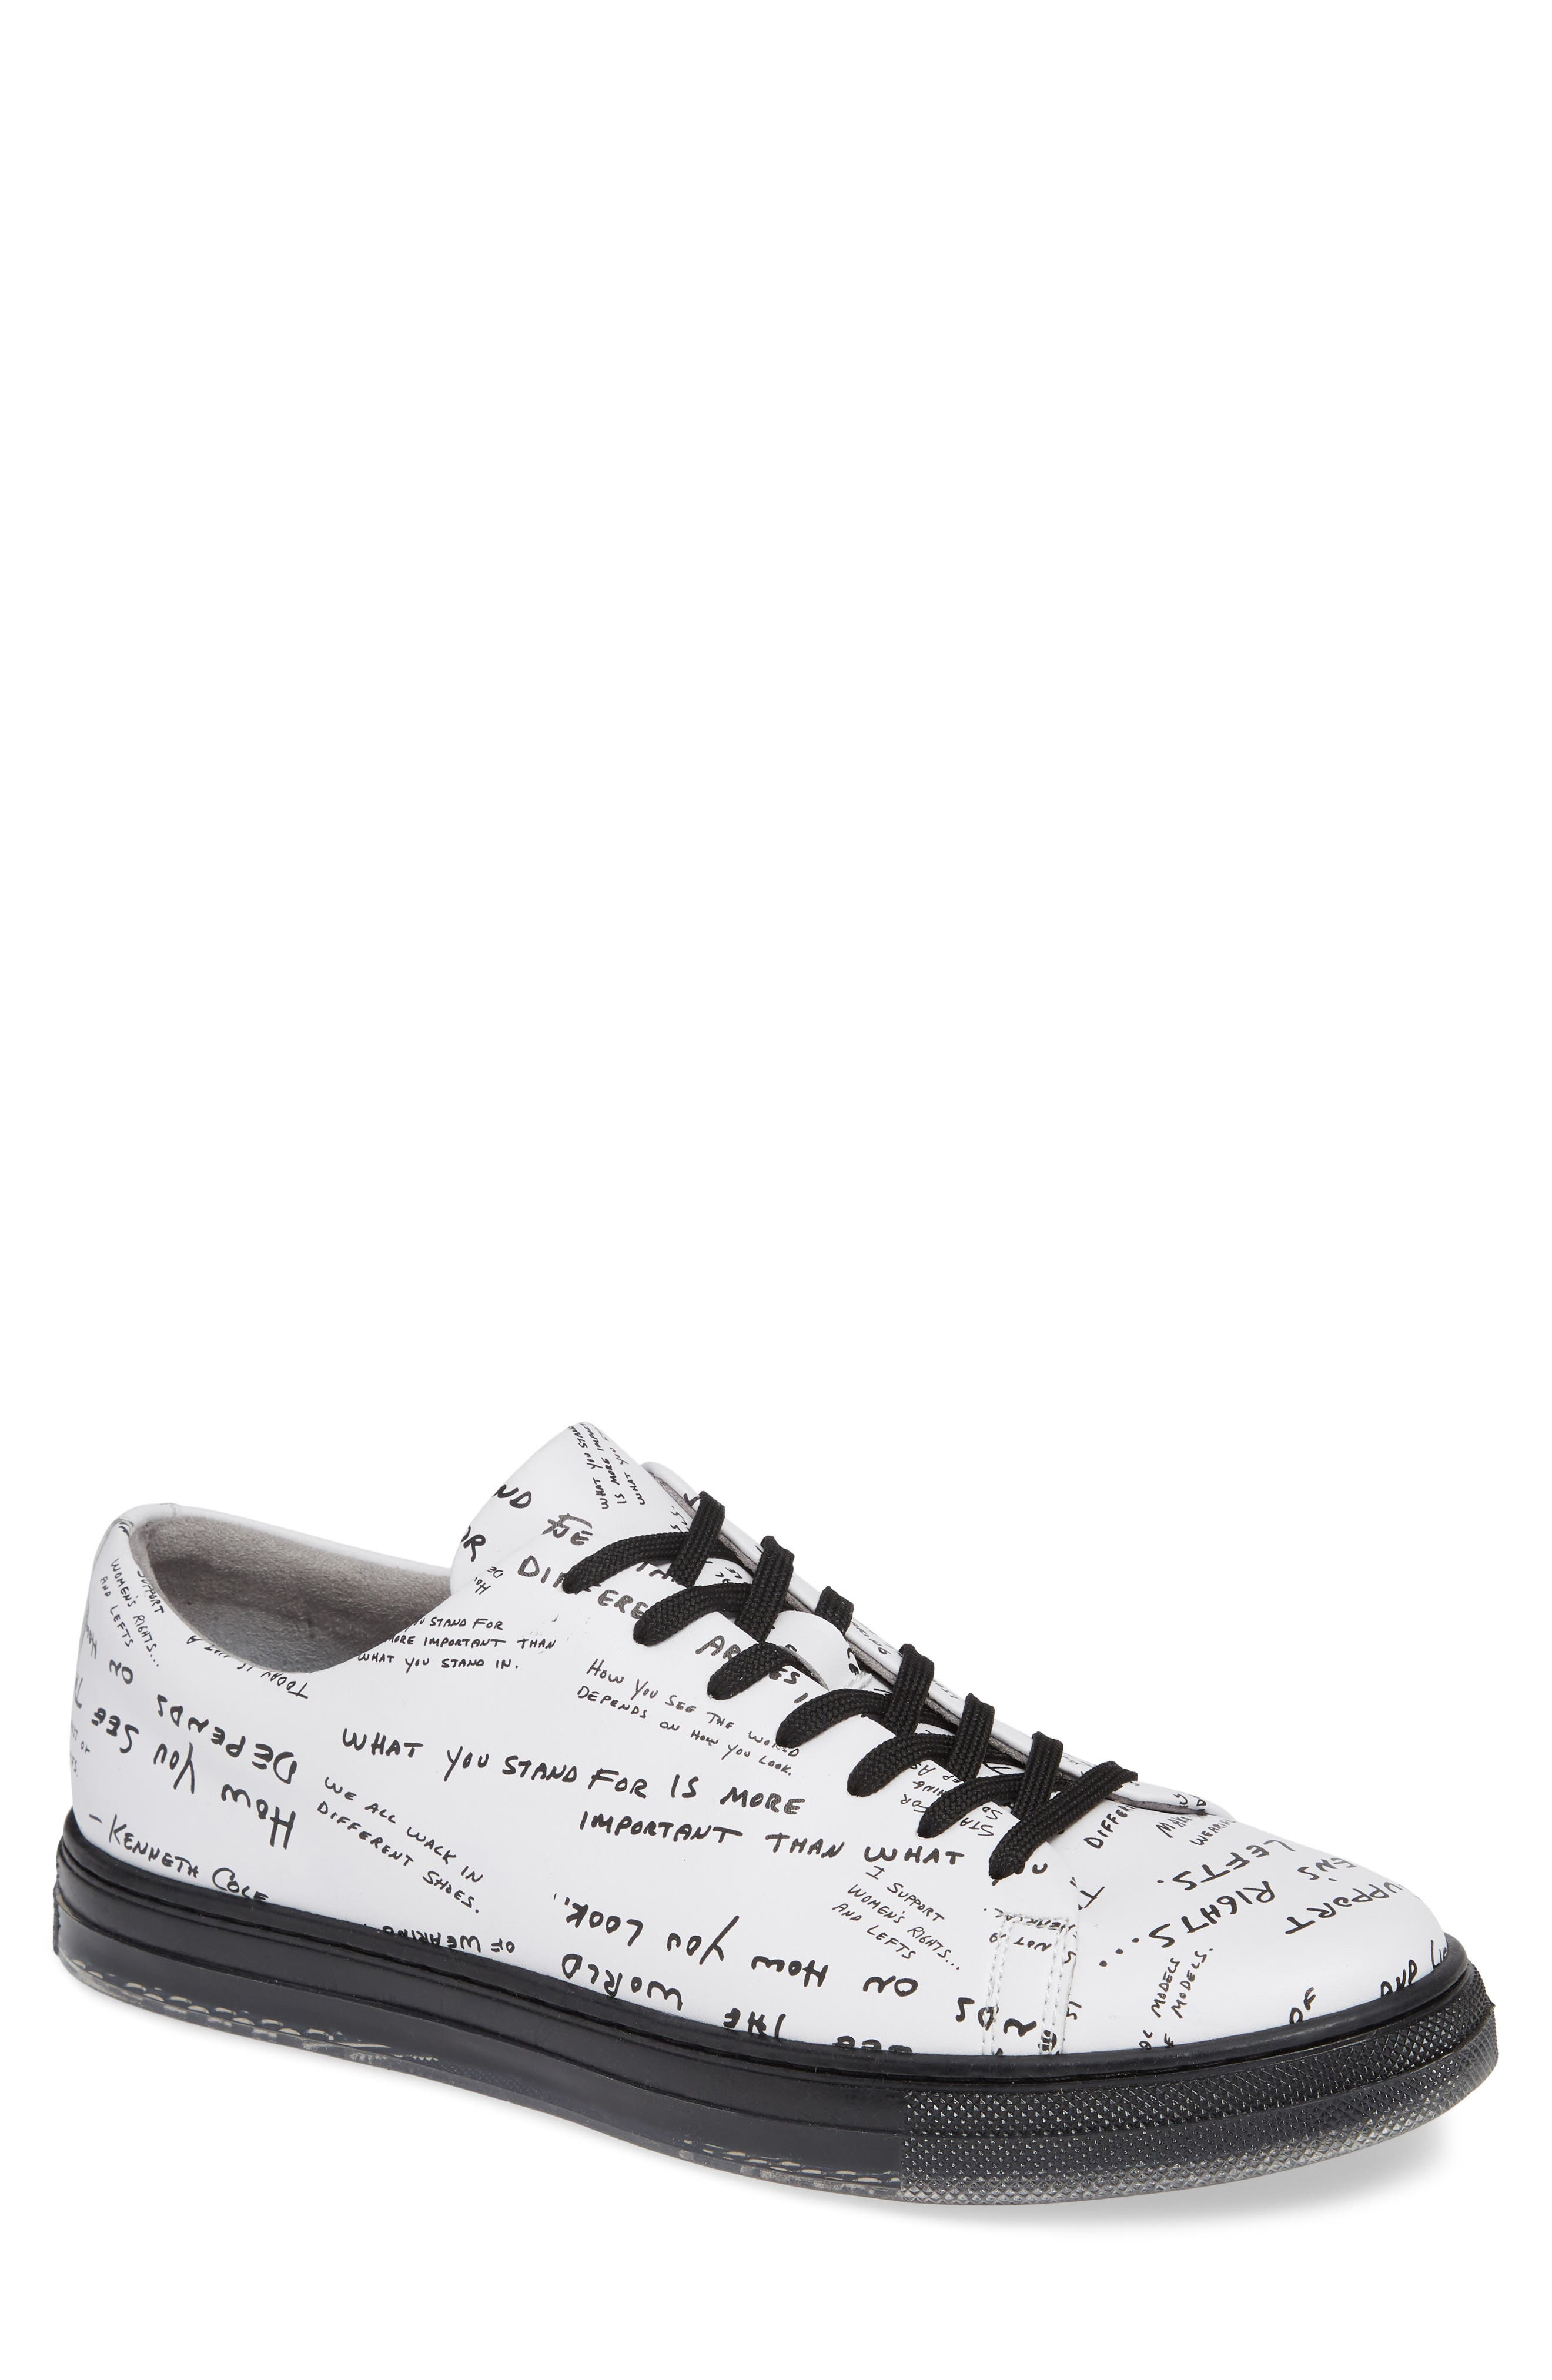 Colvin Low Sneaker,                         Main,                         color, 110